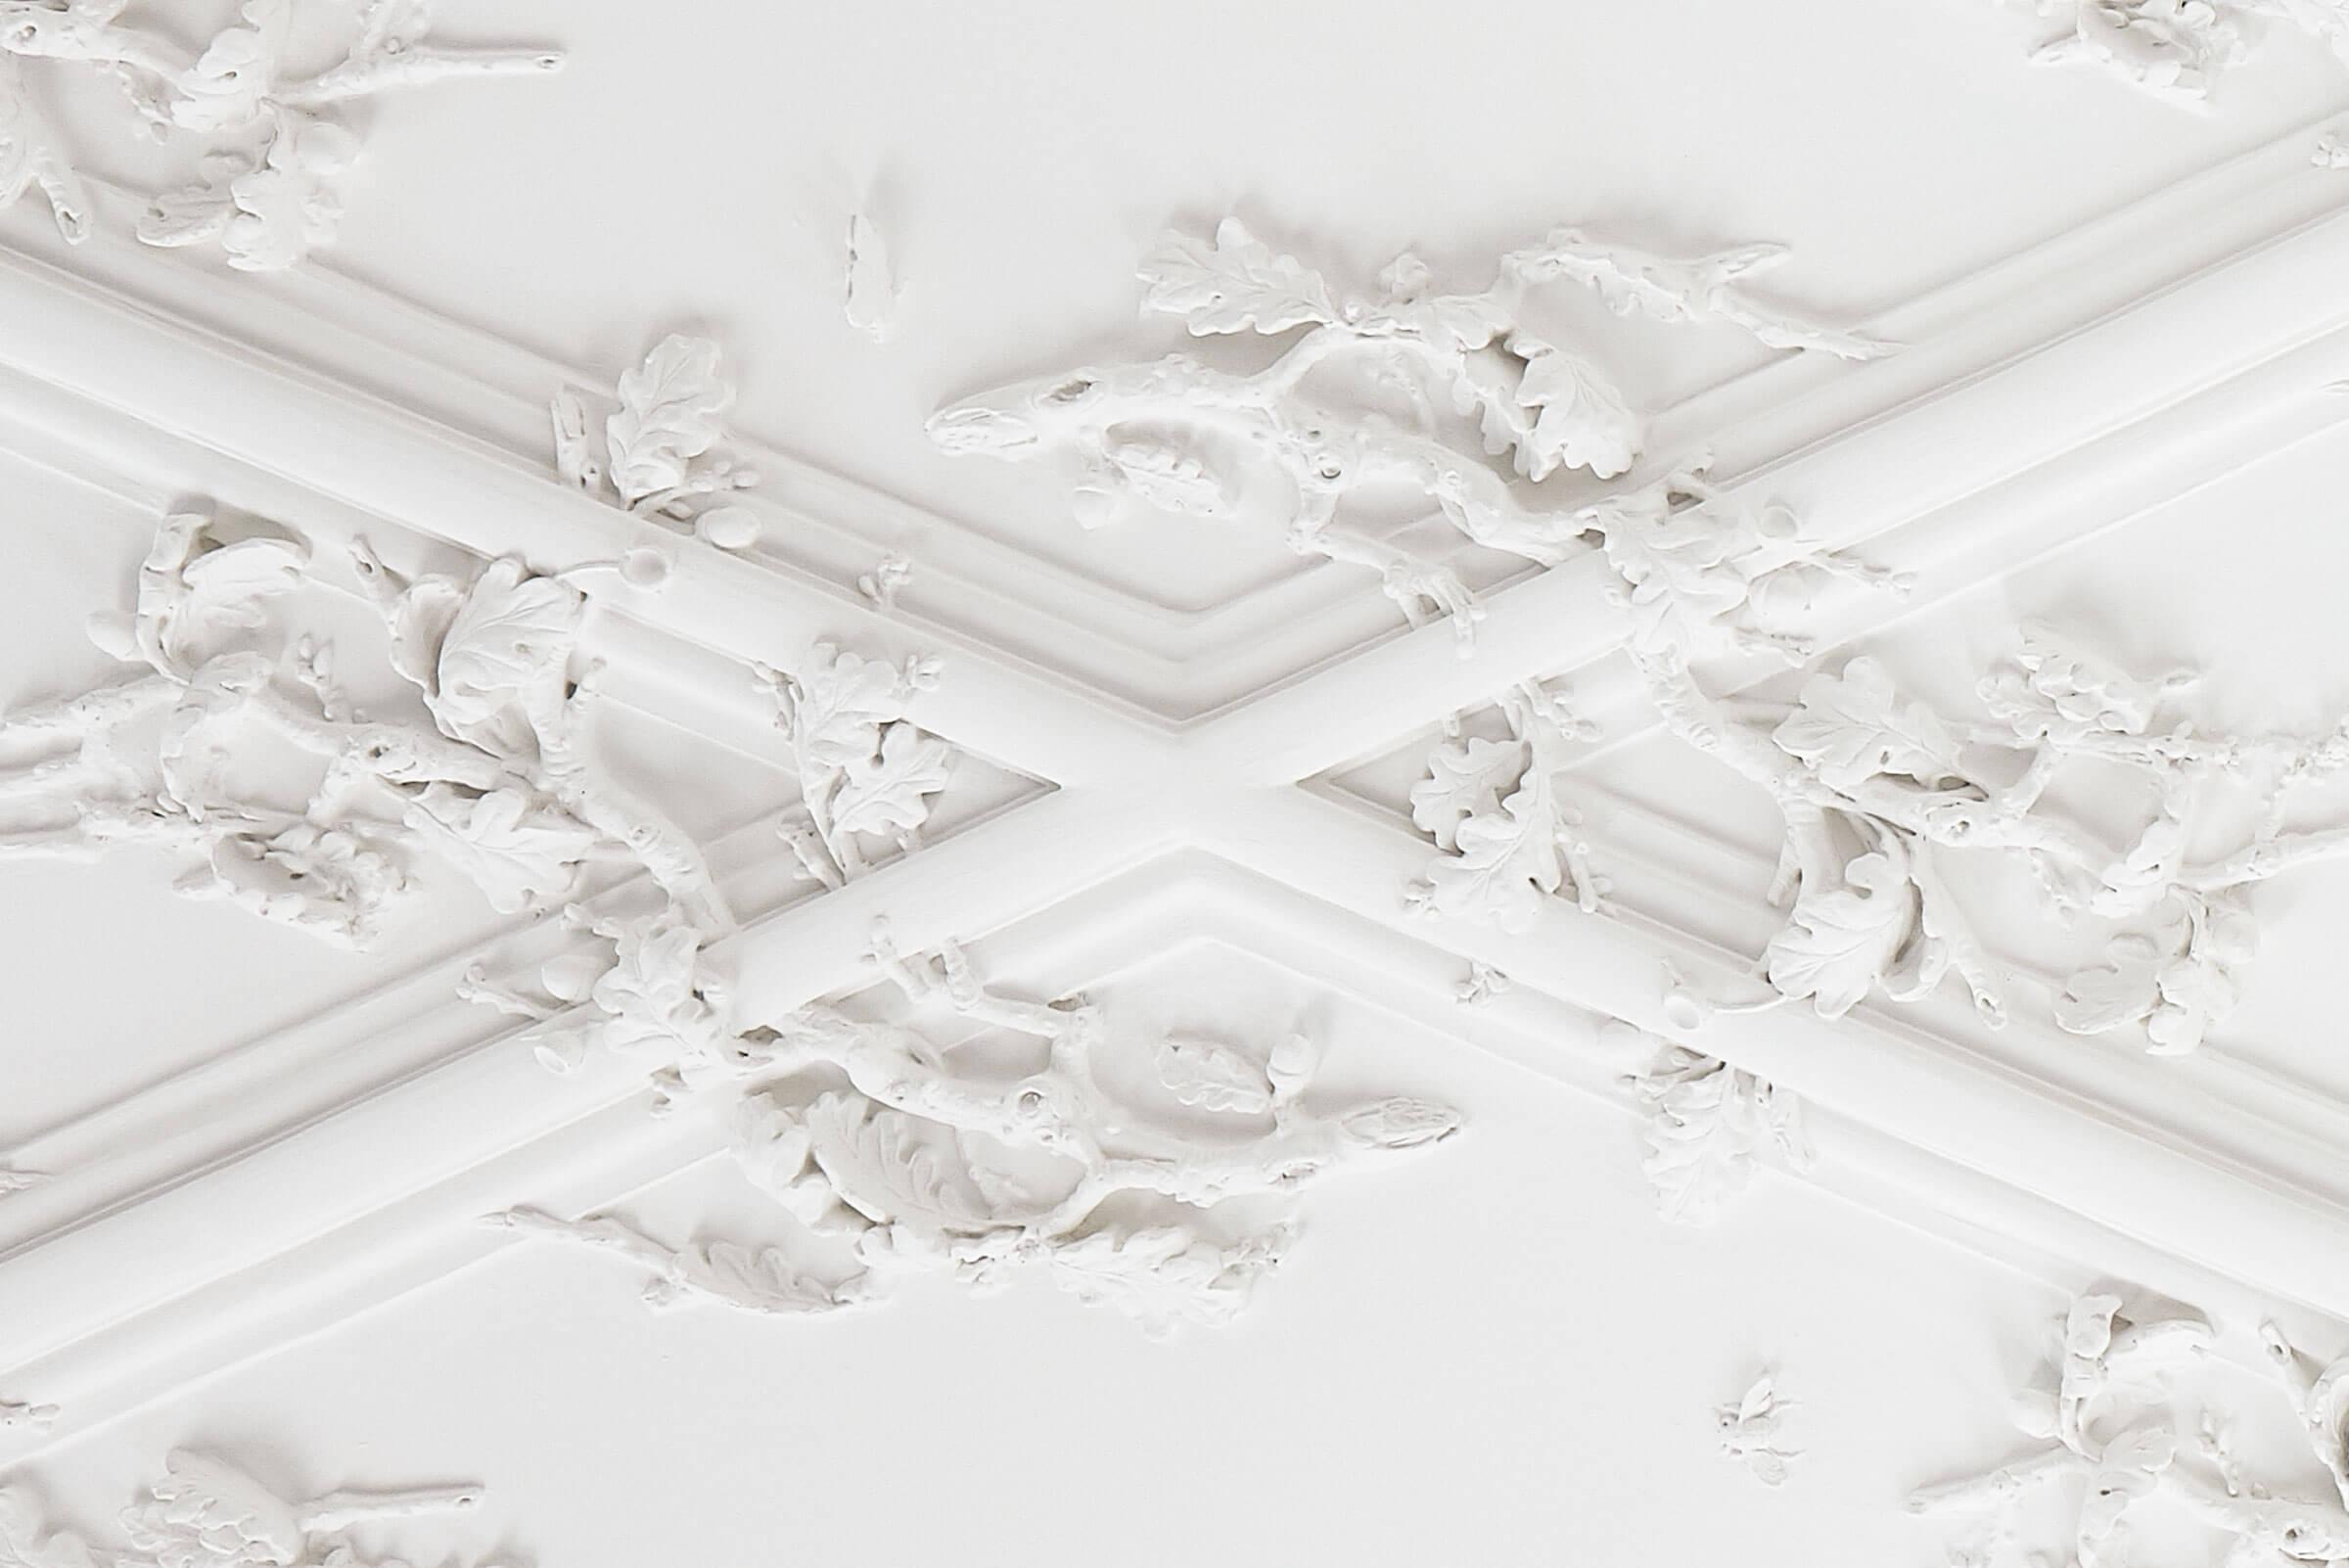 stukloft stuk moderne claus lind © interiør stuk haandvaerk stukkatur